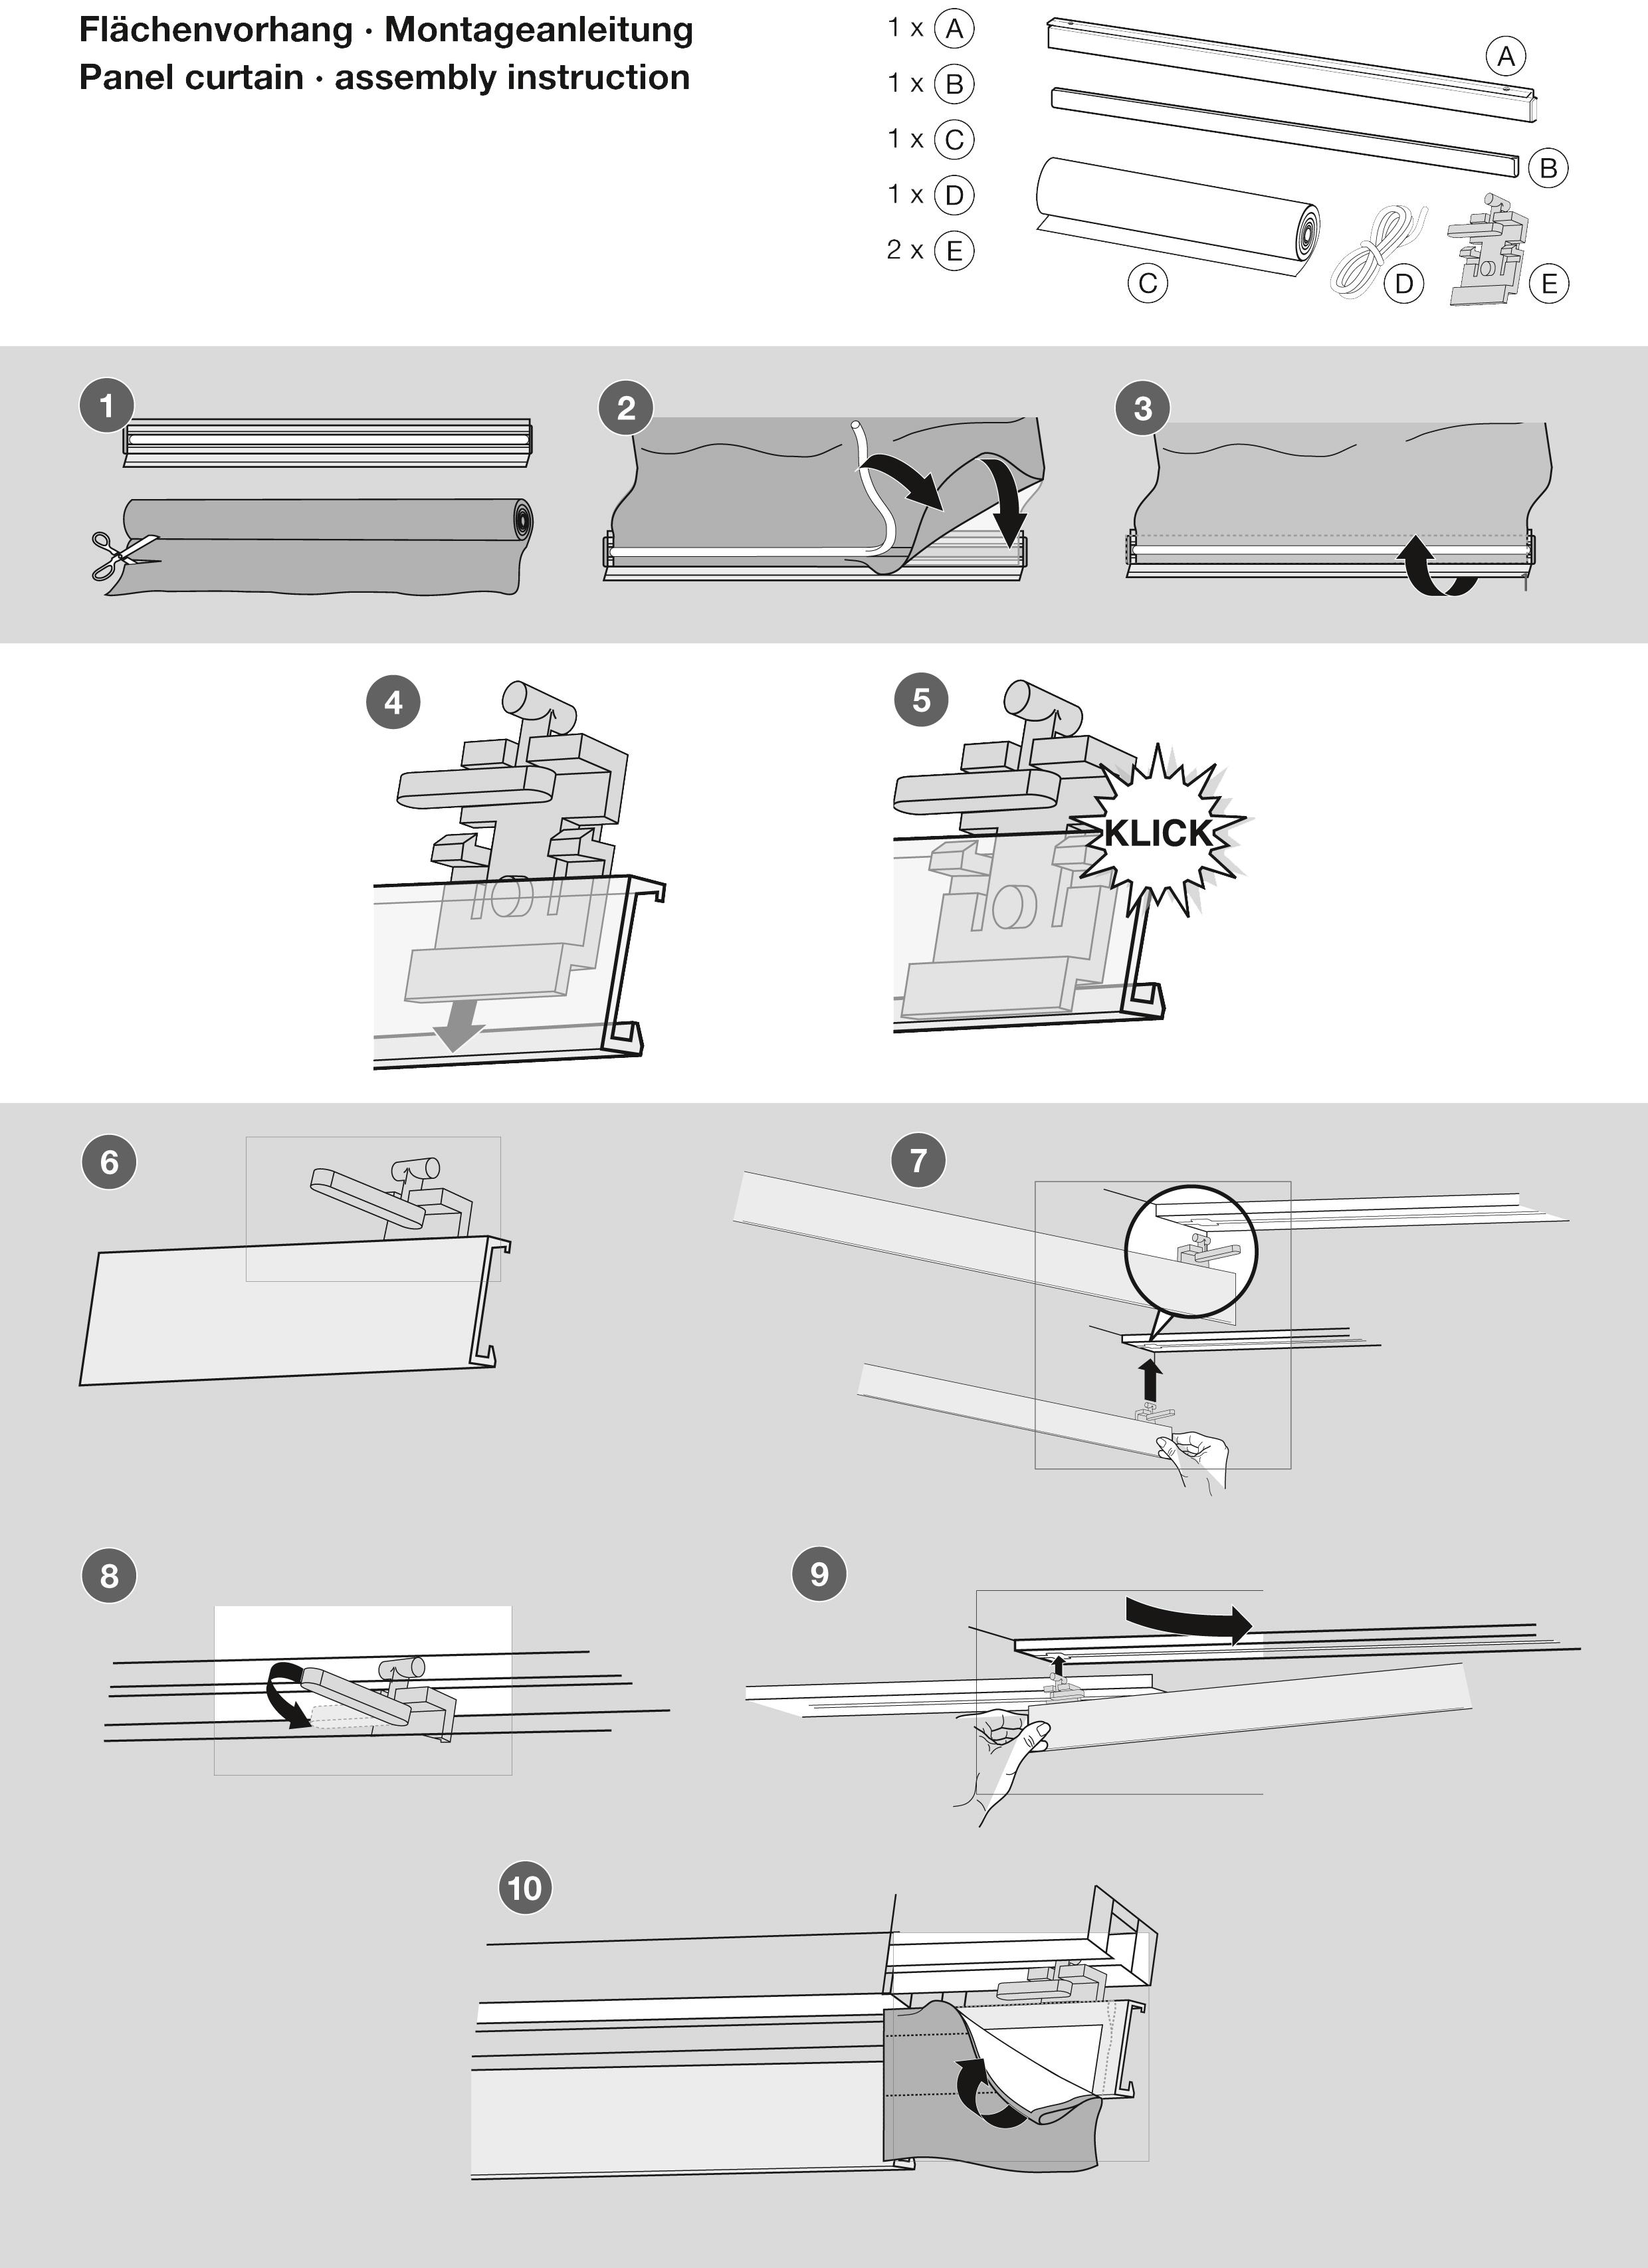 blickdicht schiebegardine digital bedruckt blickdicht. Black Bedroom Furniture Sets. Home Design Ideas